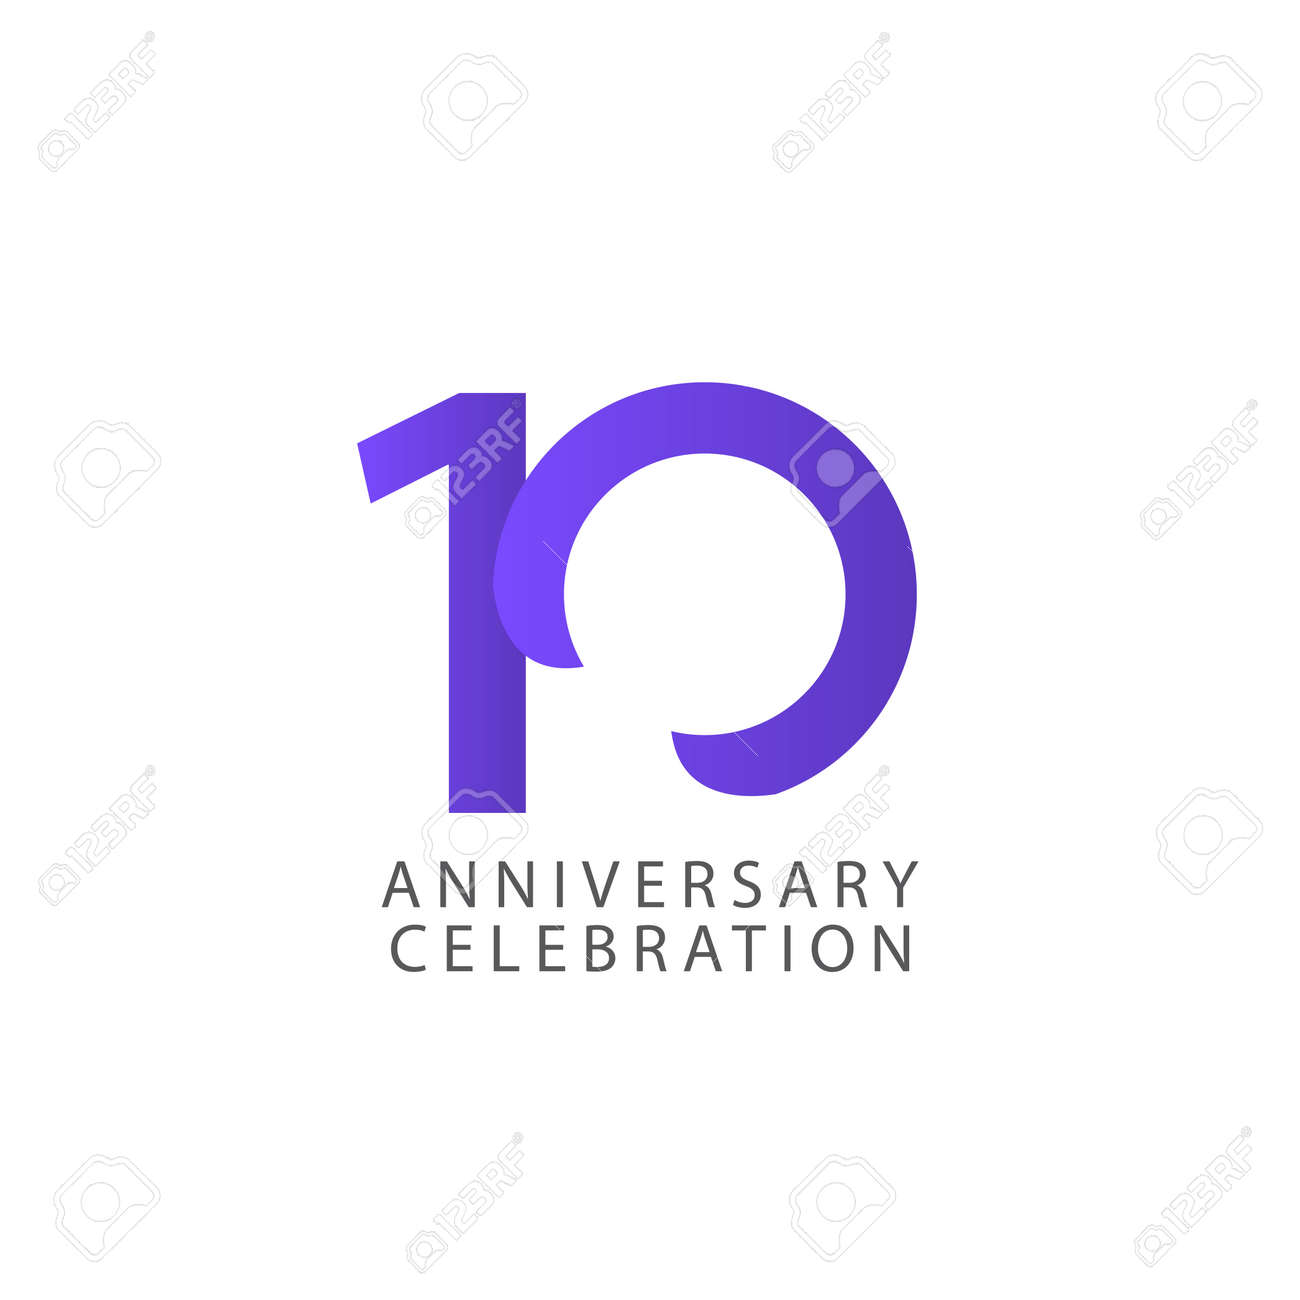 10 Years Anniversary Celebration Vector Template Design Illustration - 163698161